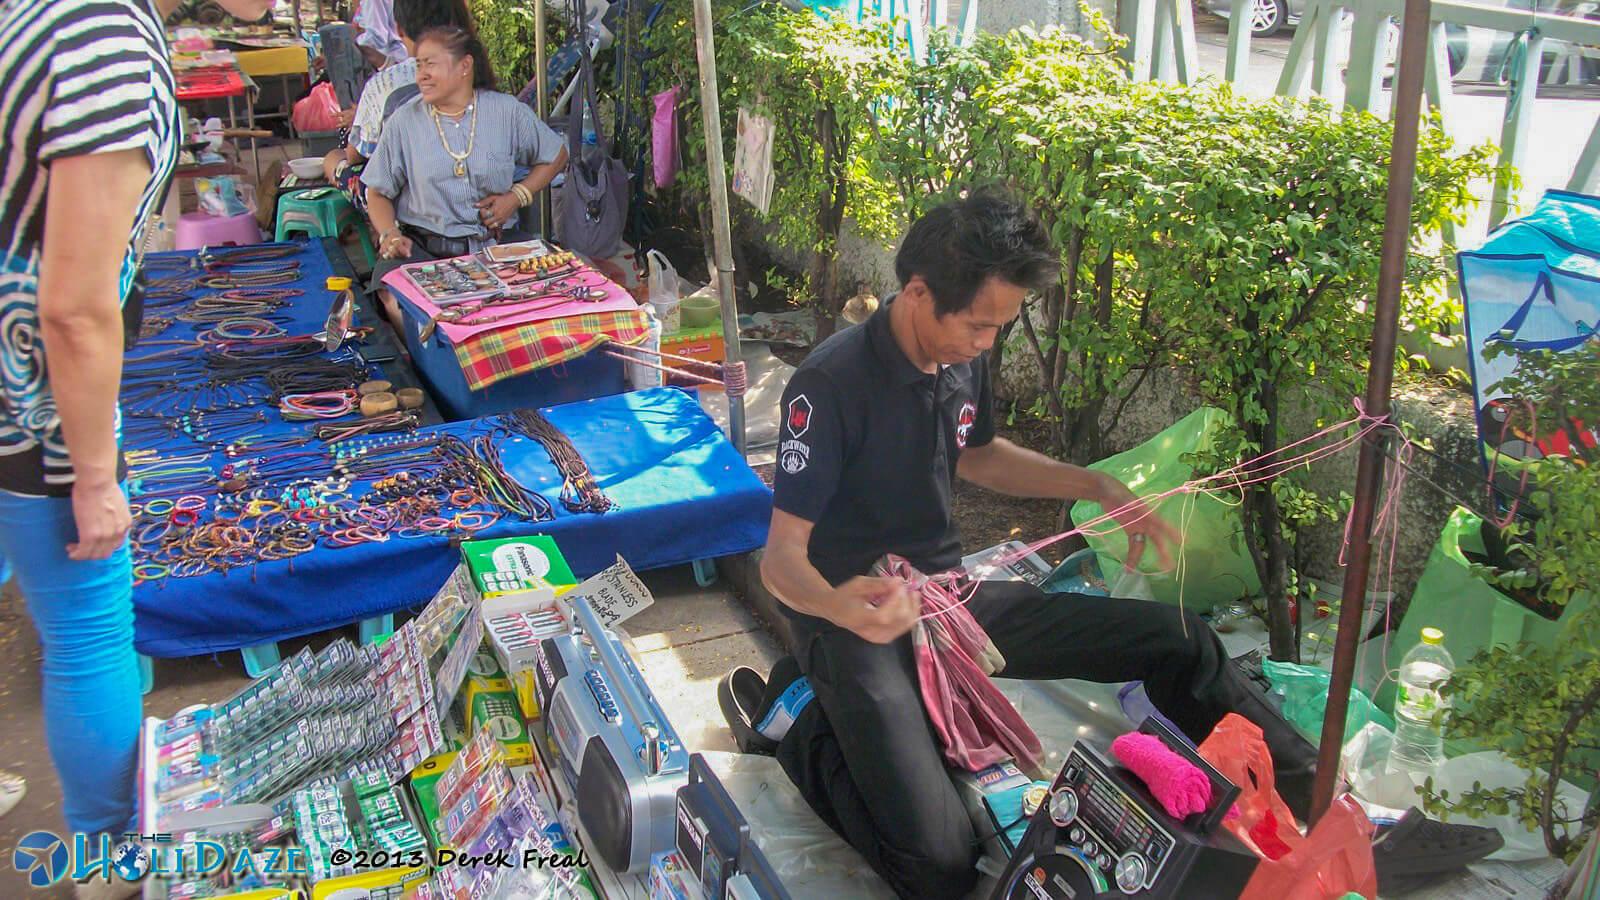 Street vendors near the Grand Palace in Bangkok, Thailand